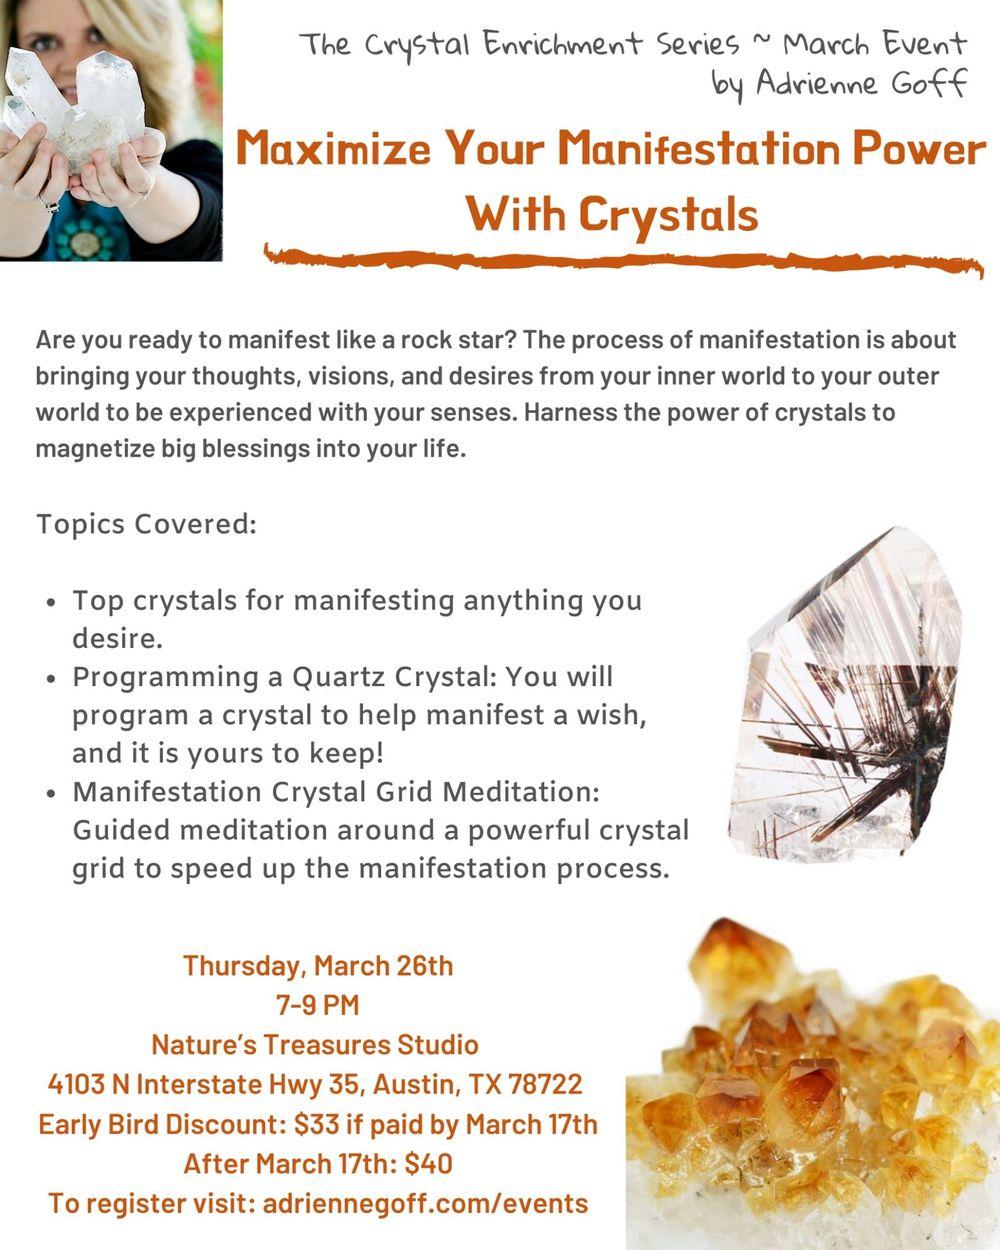 Crystal Enrichment Series: Manifest